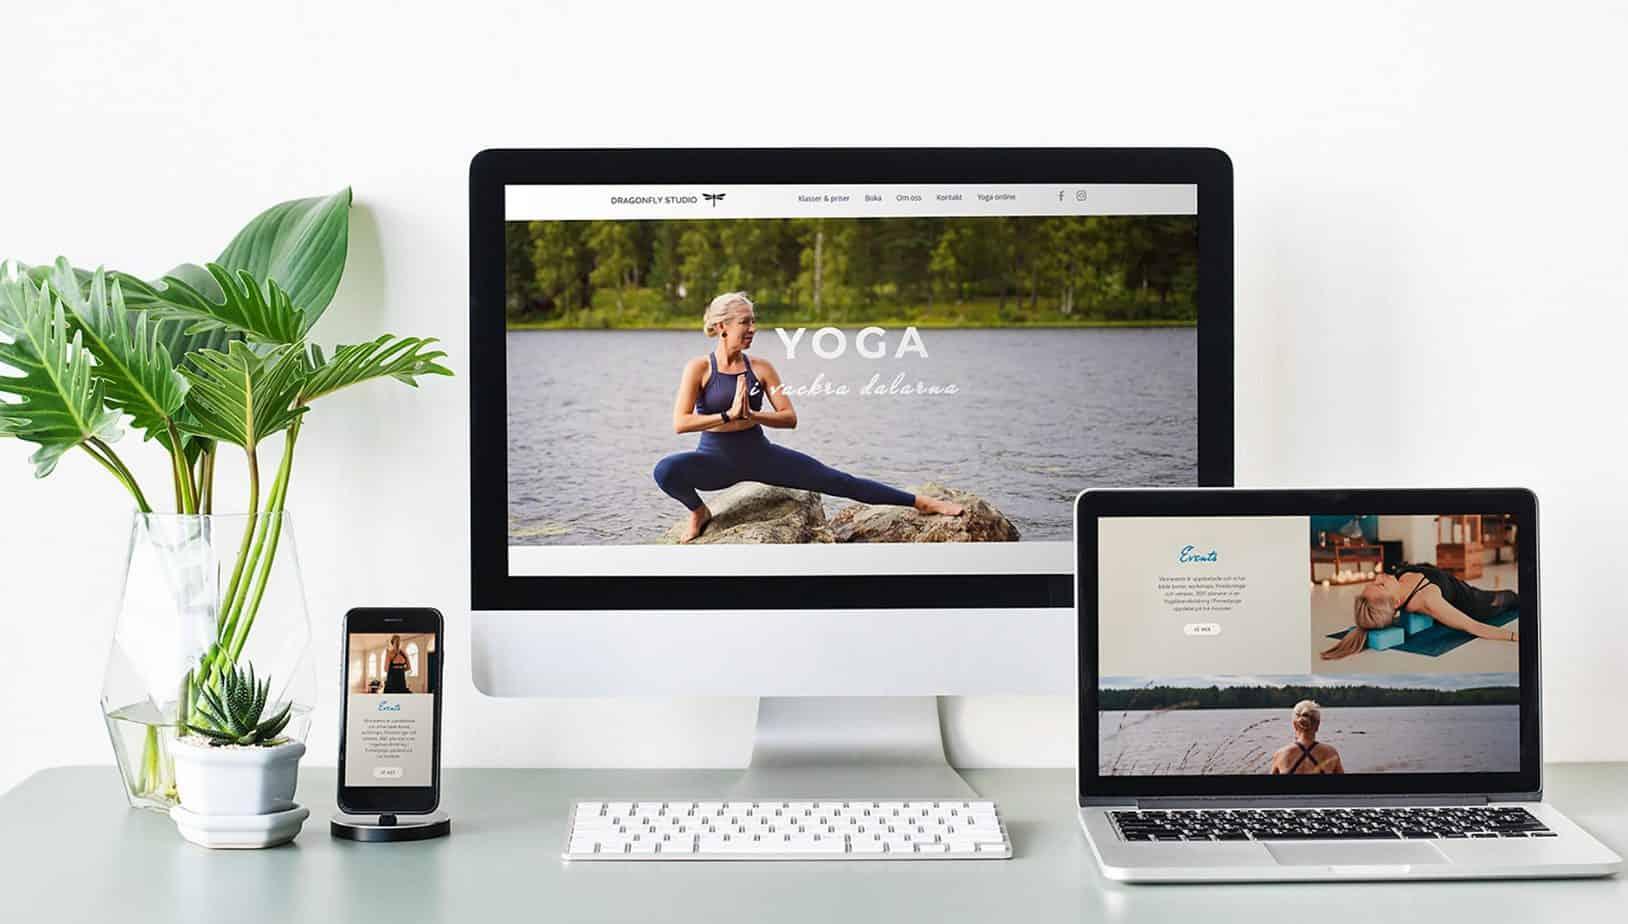 Graphiclagoon Slideshows_website_yoga-scaled Dragonfly Yoga Studio